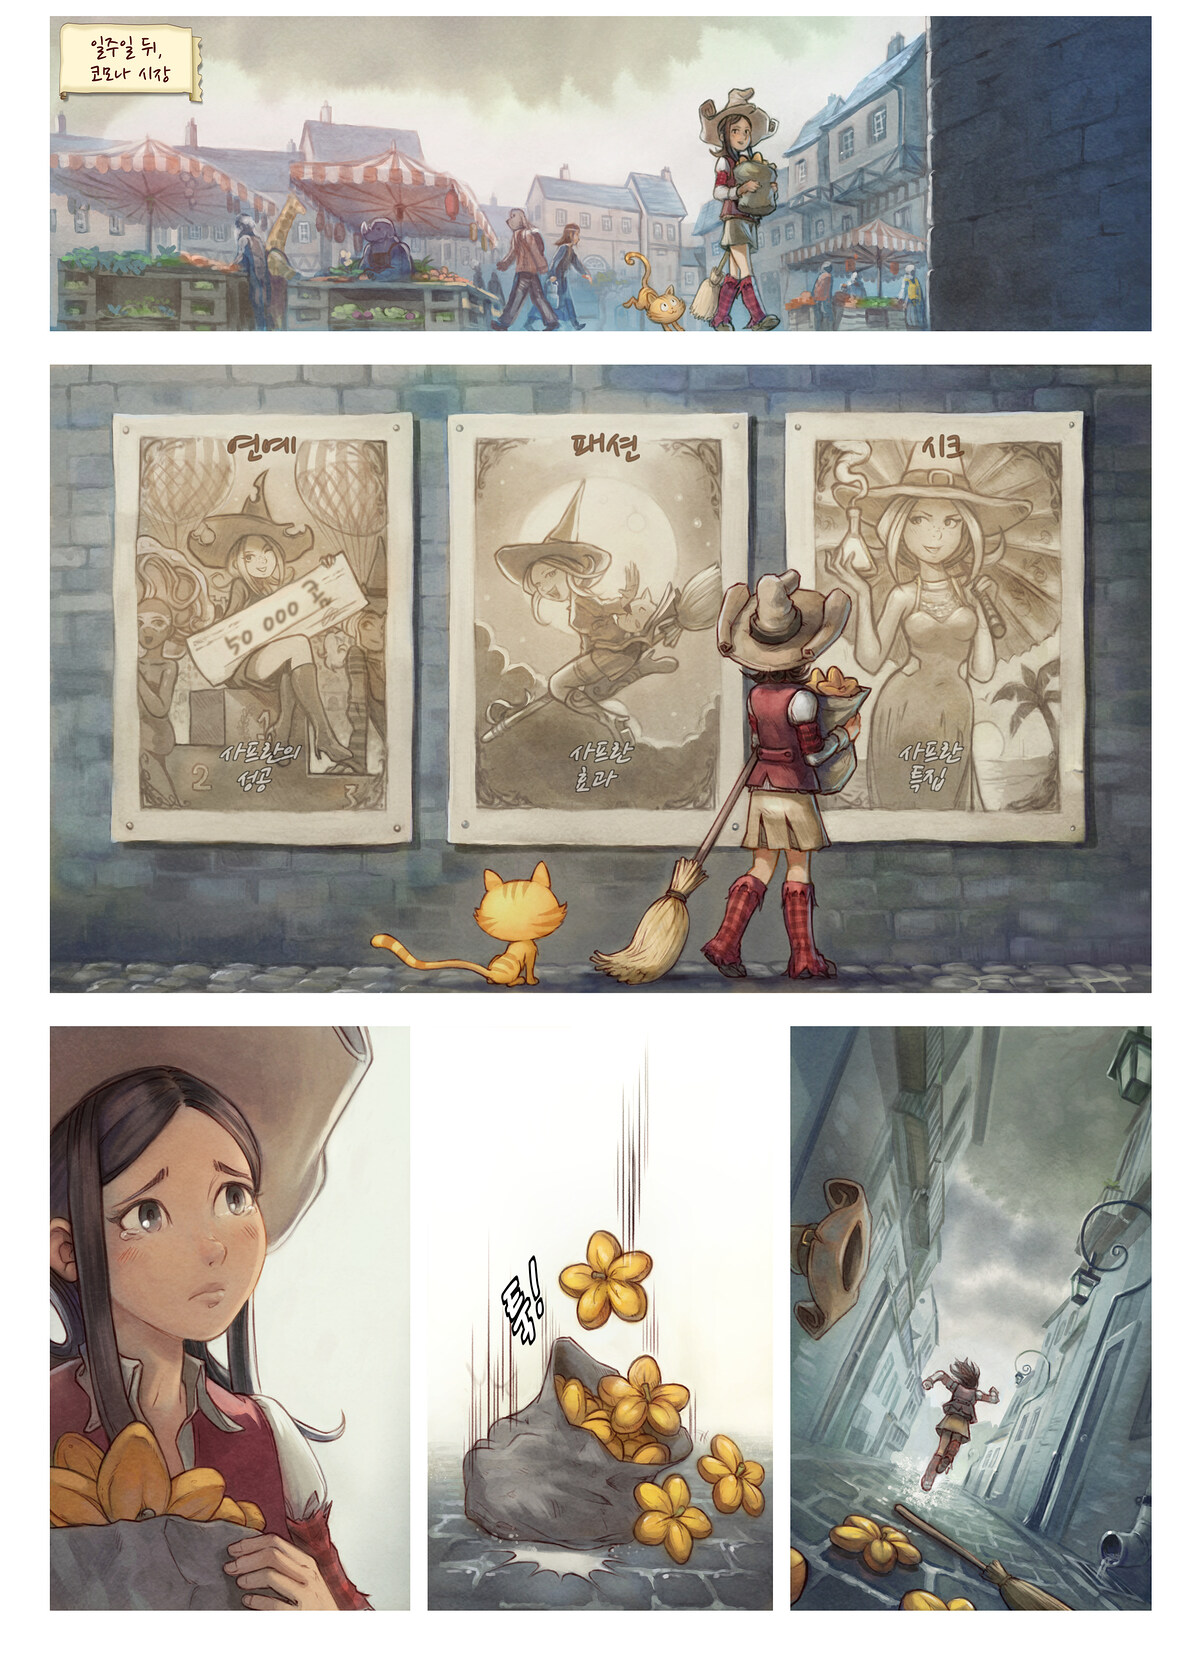 A webcomic page of Pepper&Carrot, 에피소드 23 [kr], 페이지 1